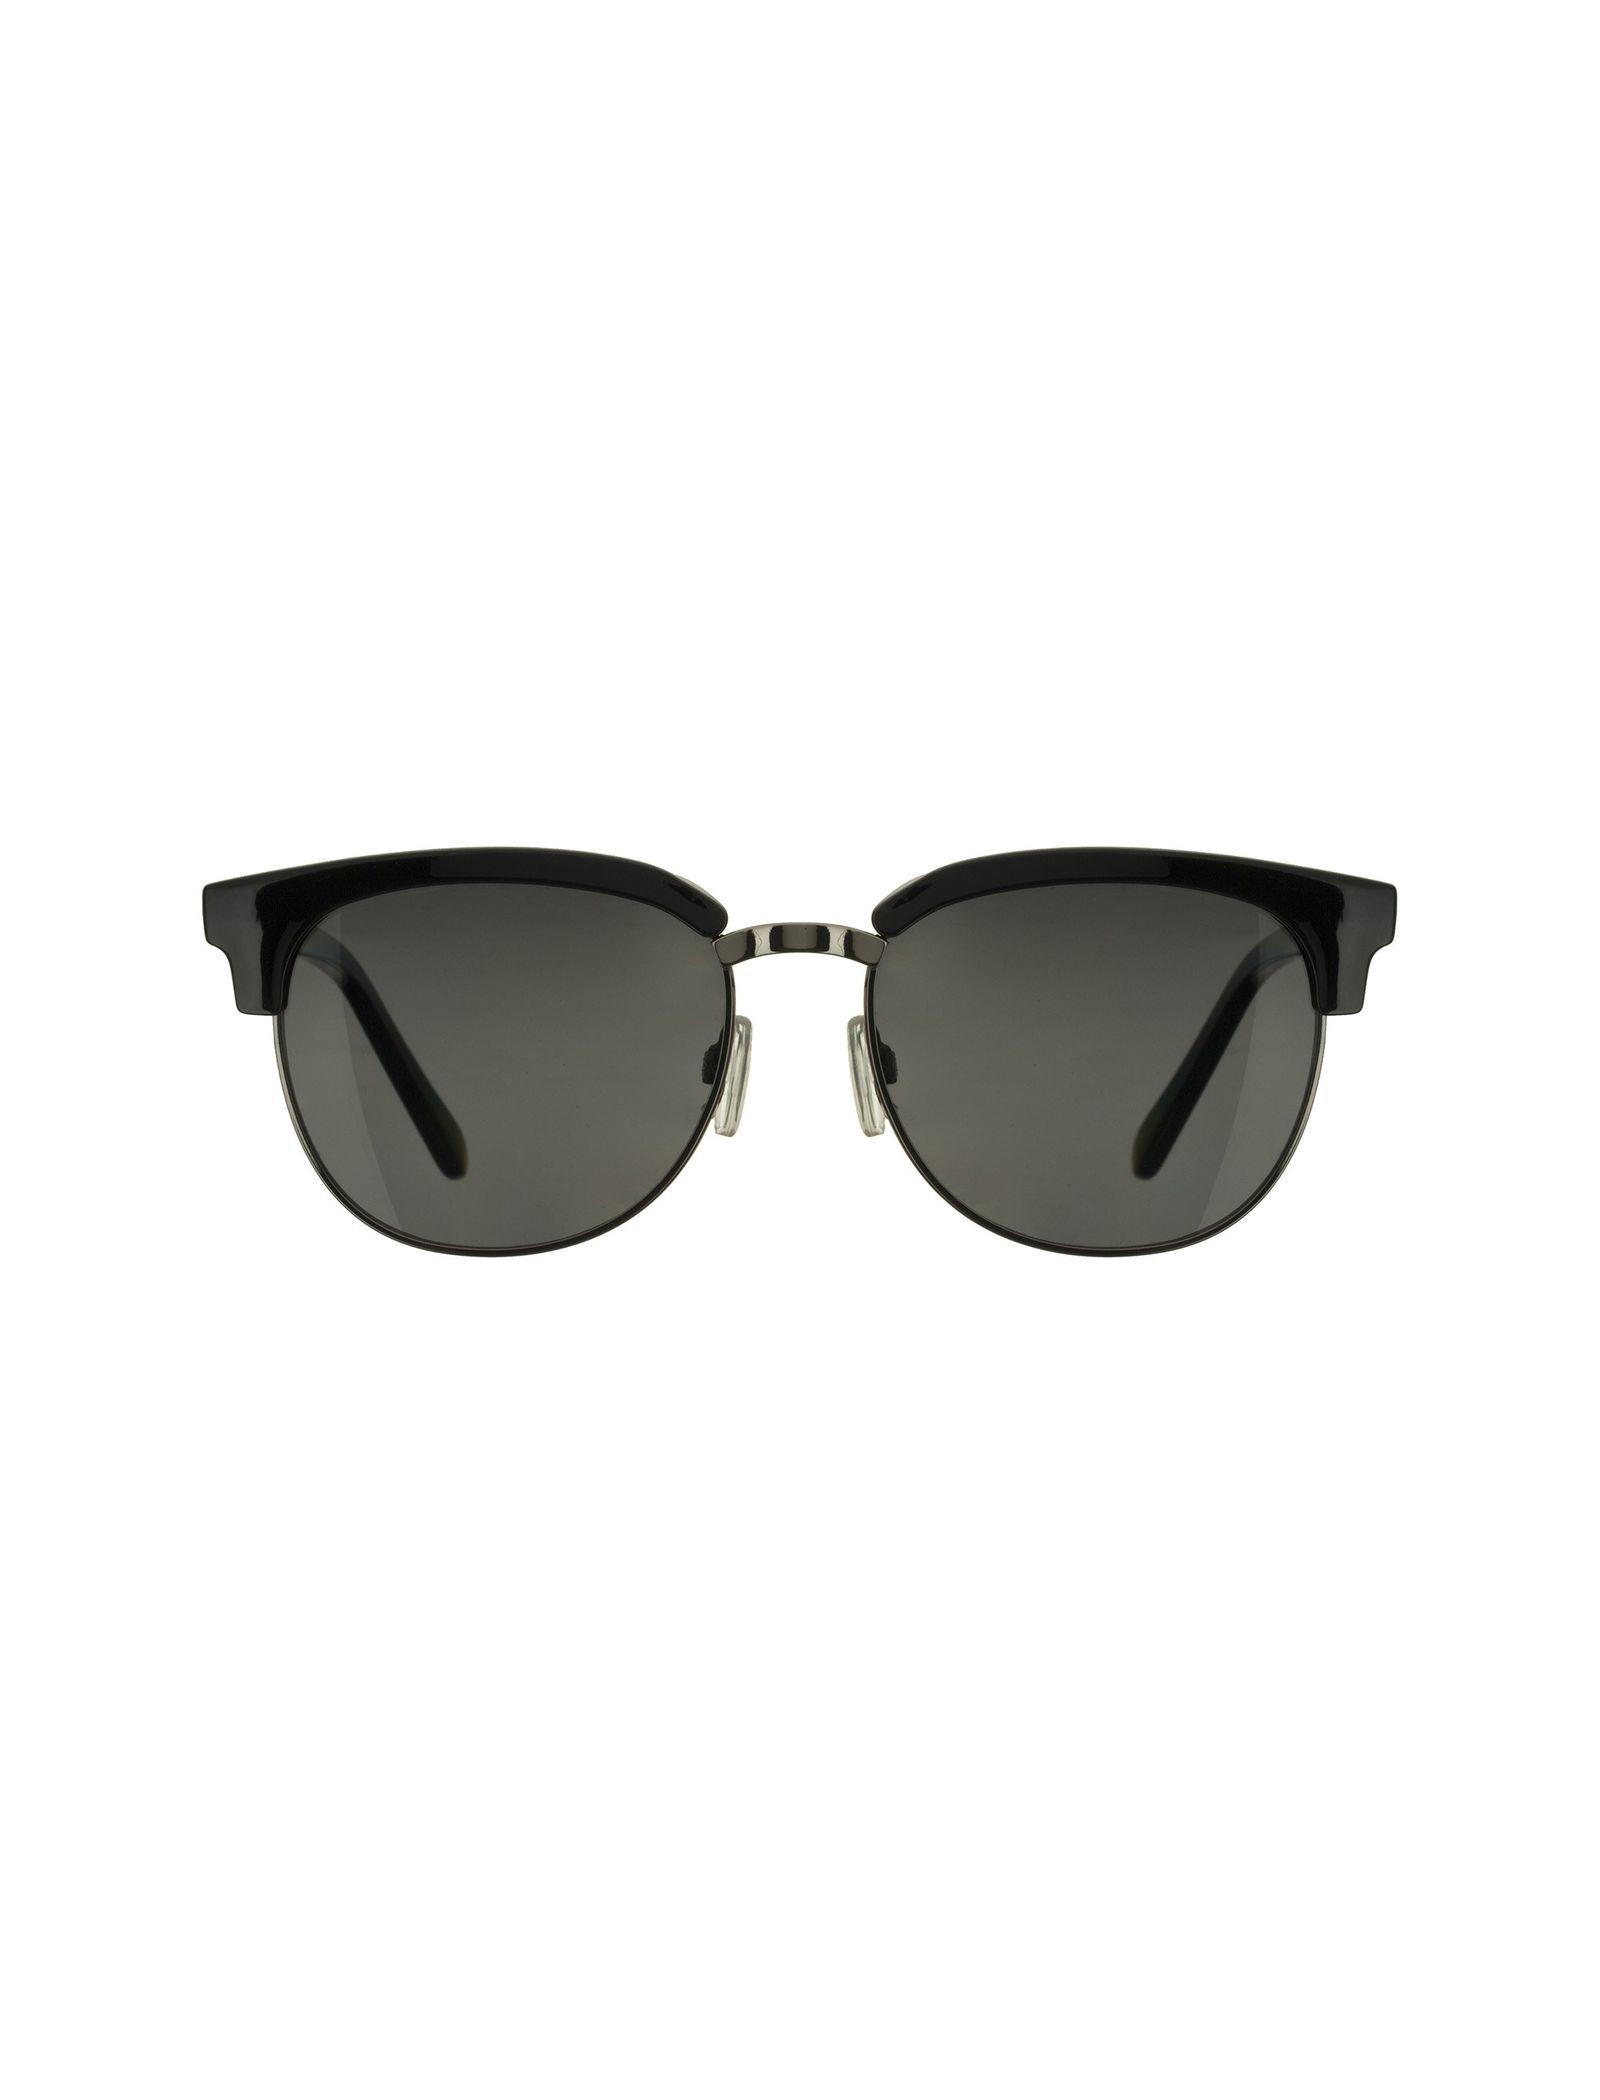 عینک آفتابی کلاب مستر مردانه - دون لندن - مشکي - 1